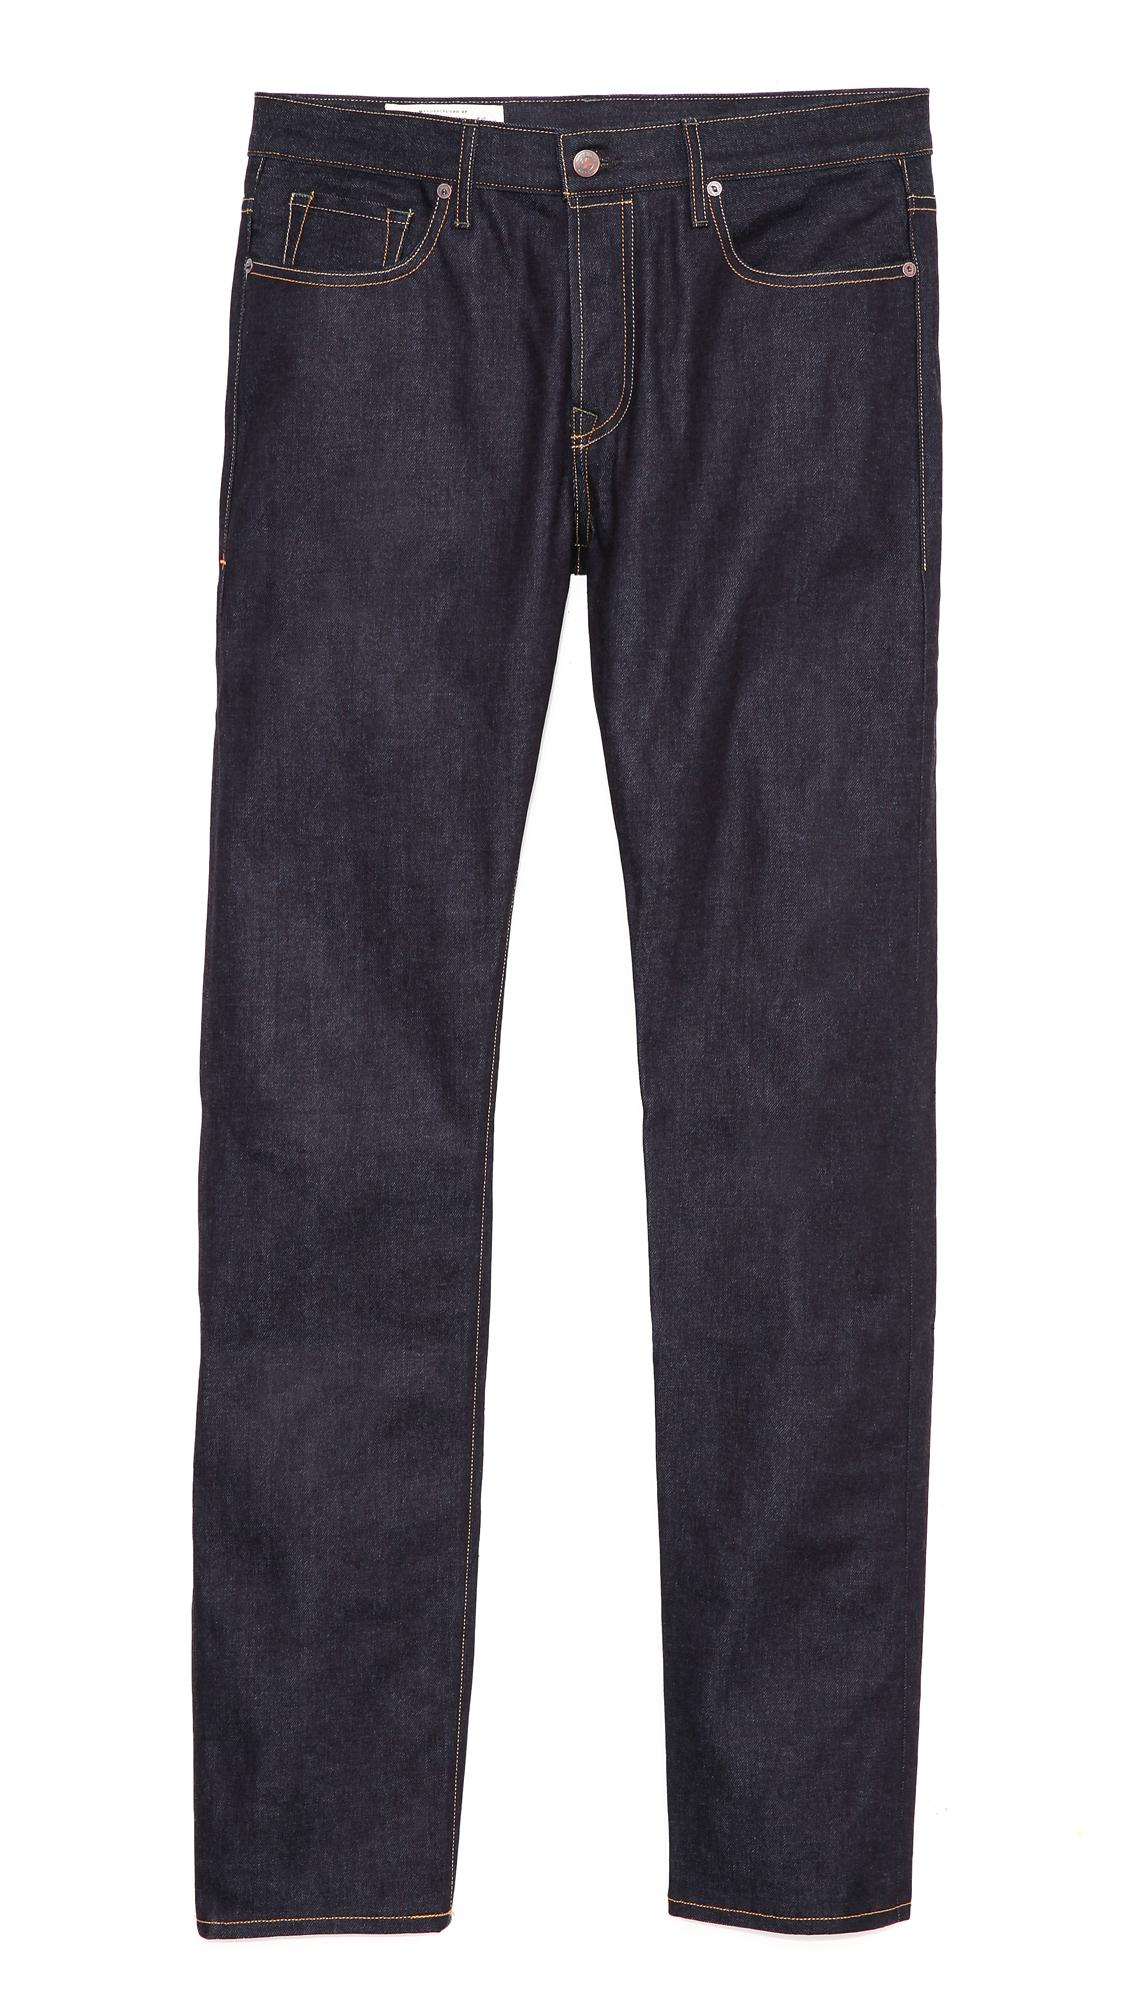 a109d3ea3 Imogene & Willie Barton Rigid Slim Straight Jeans in Blue for Men - Lyst